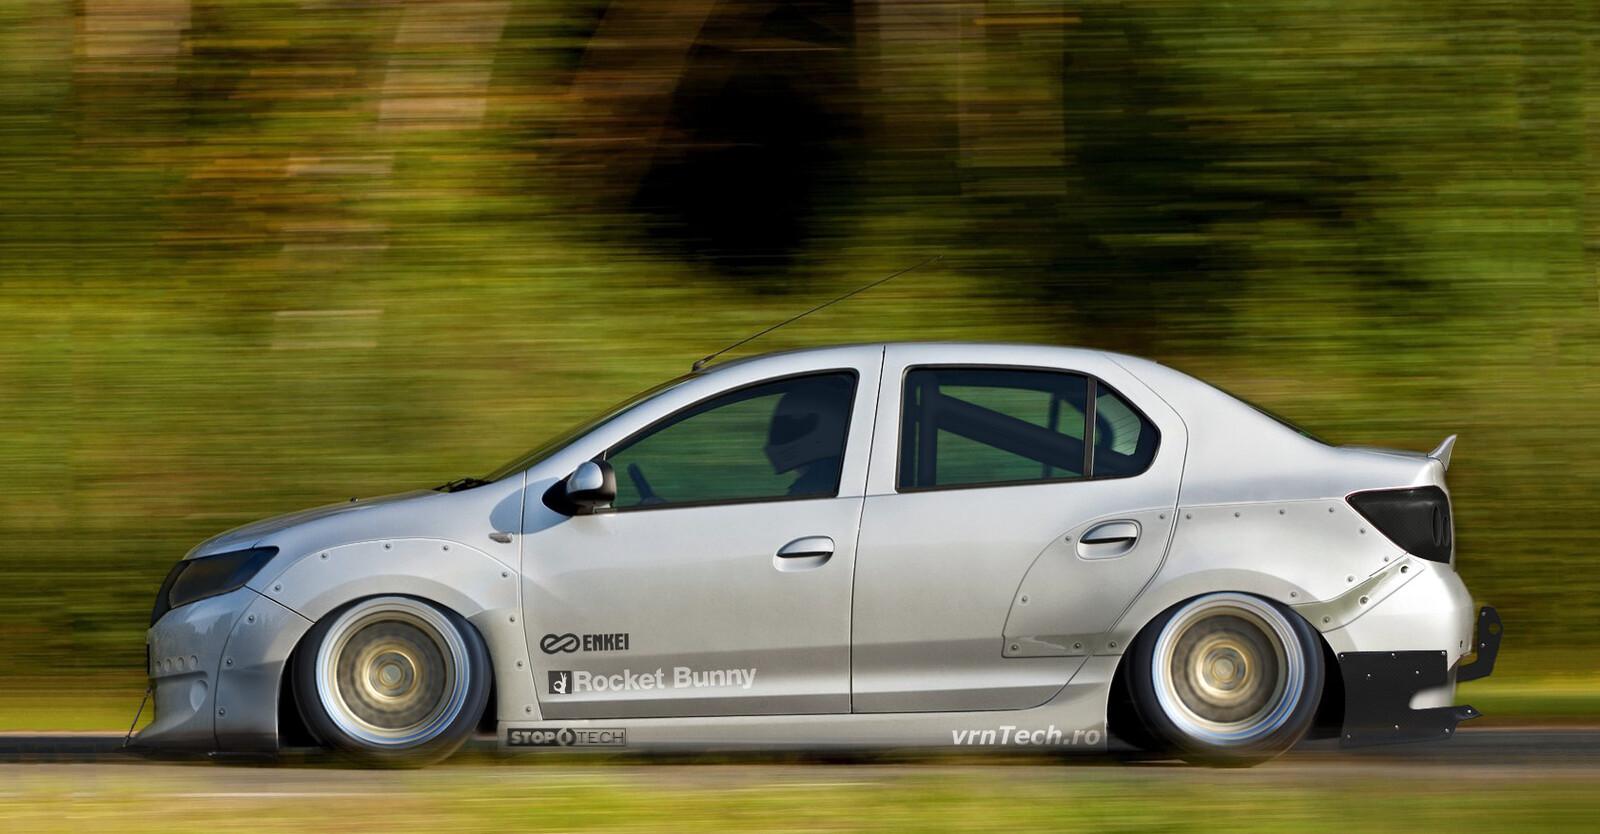 A Dacia Logan with the usual Rocket Bunny treatment.